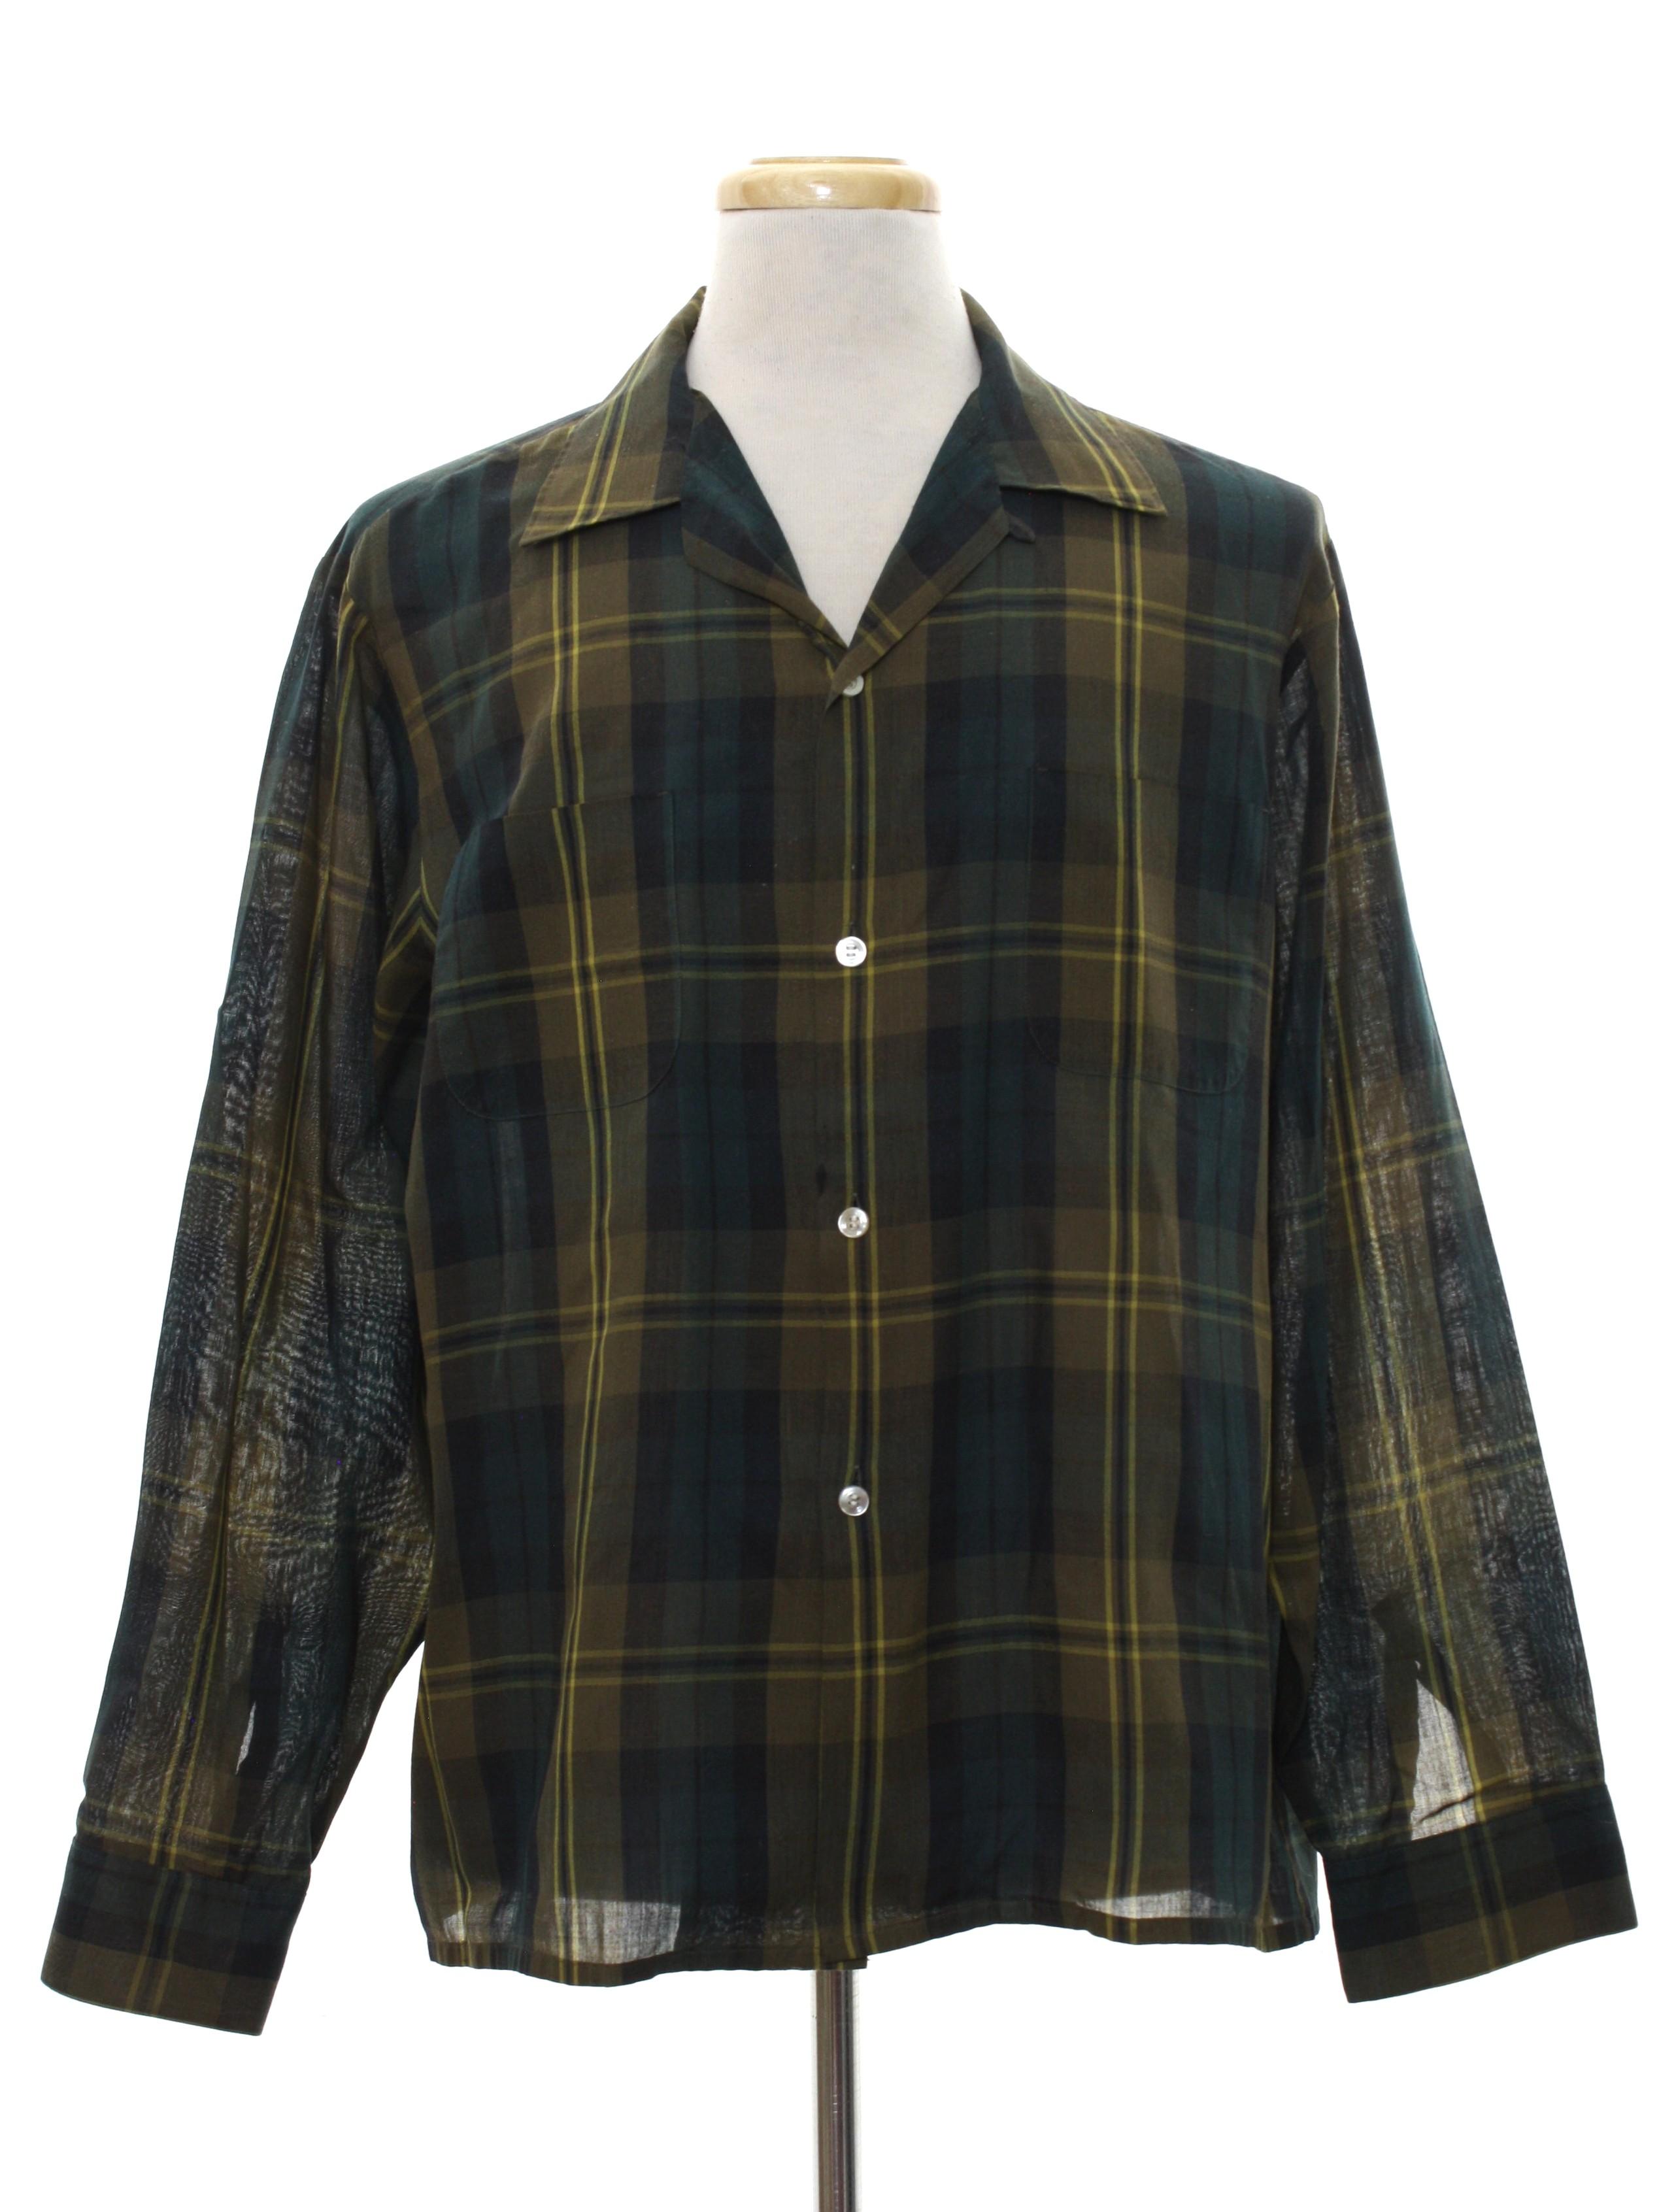 d042418ccc8c7 1960's McGregor Scotset Mens Mod Sport Shirt